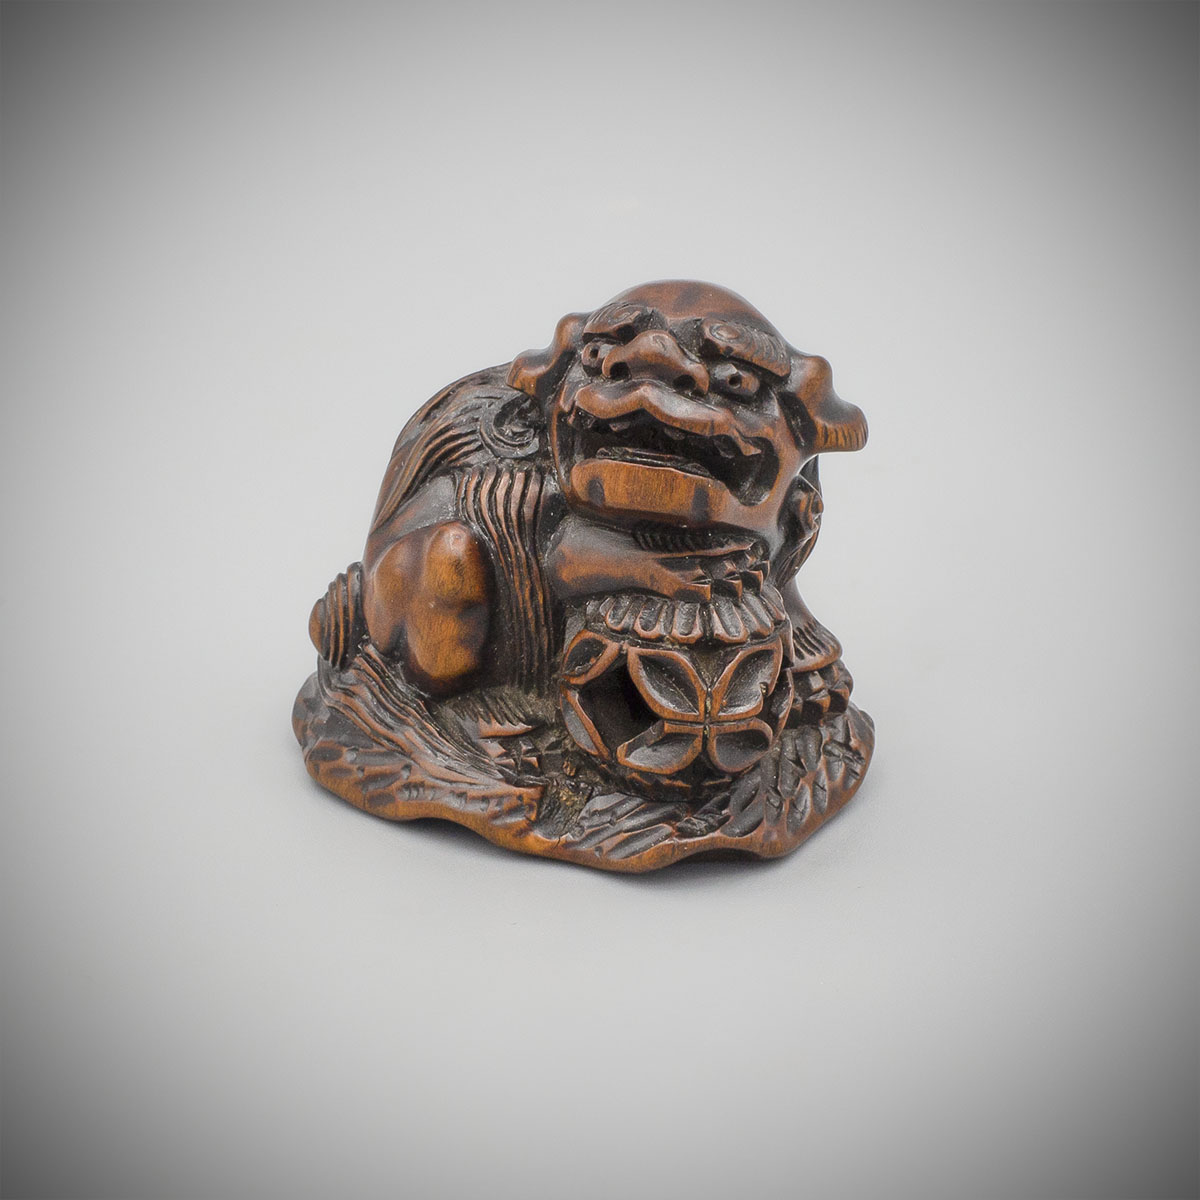 MR3691_v.1 Dark stained wood netsuke of a shishi by Minkoku